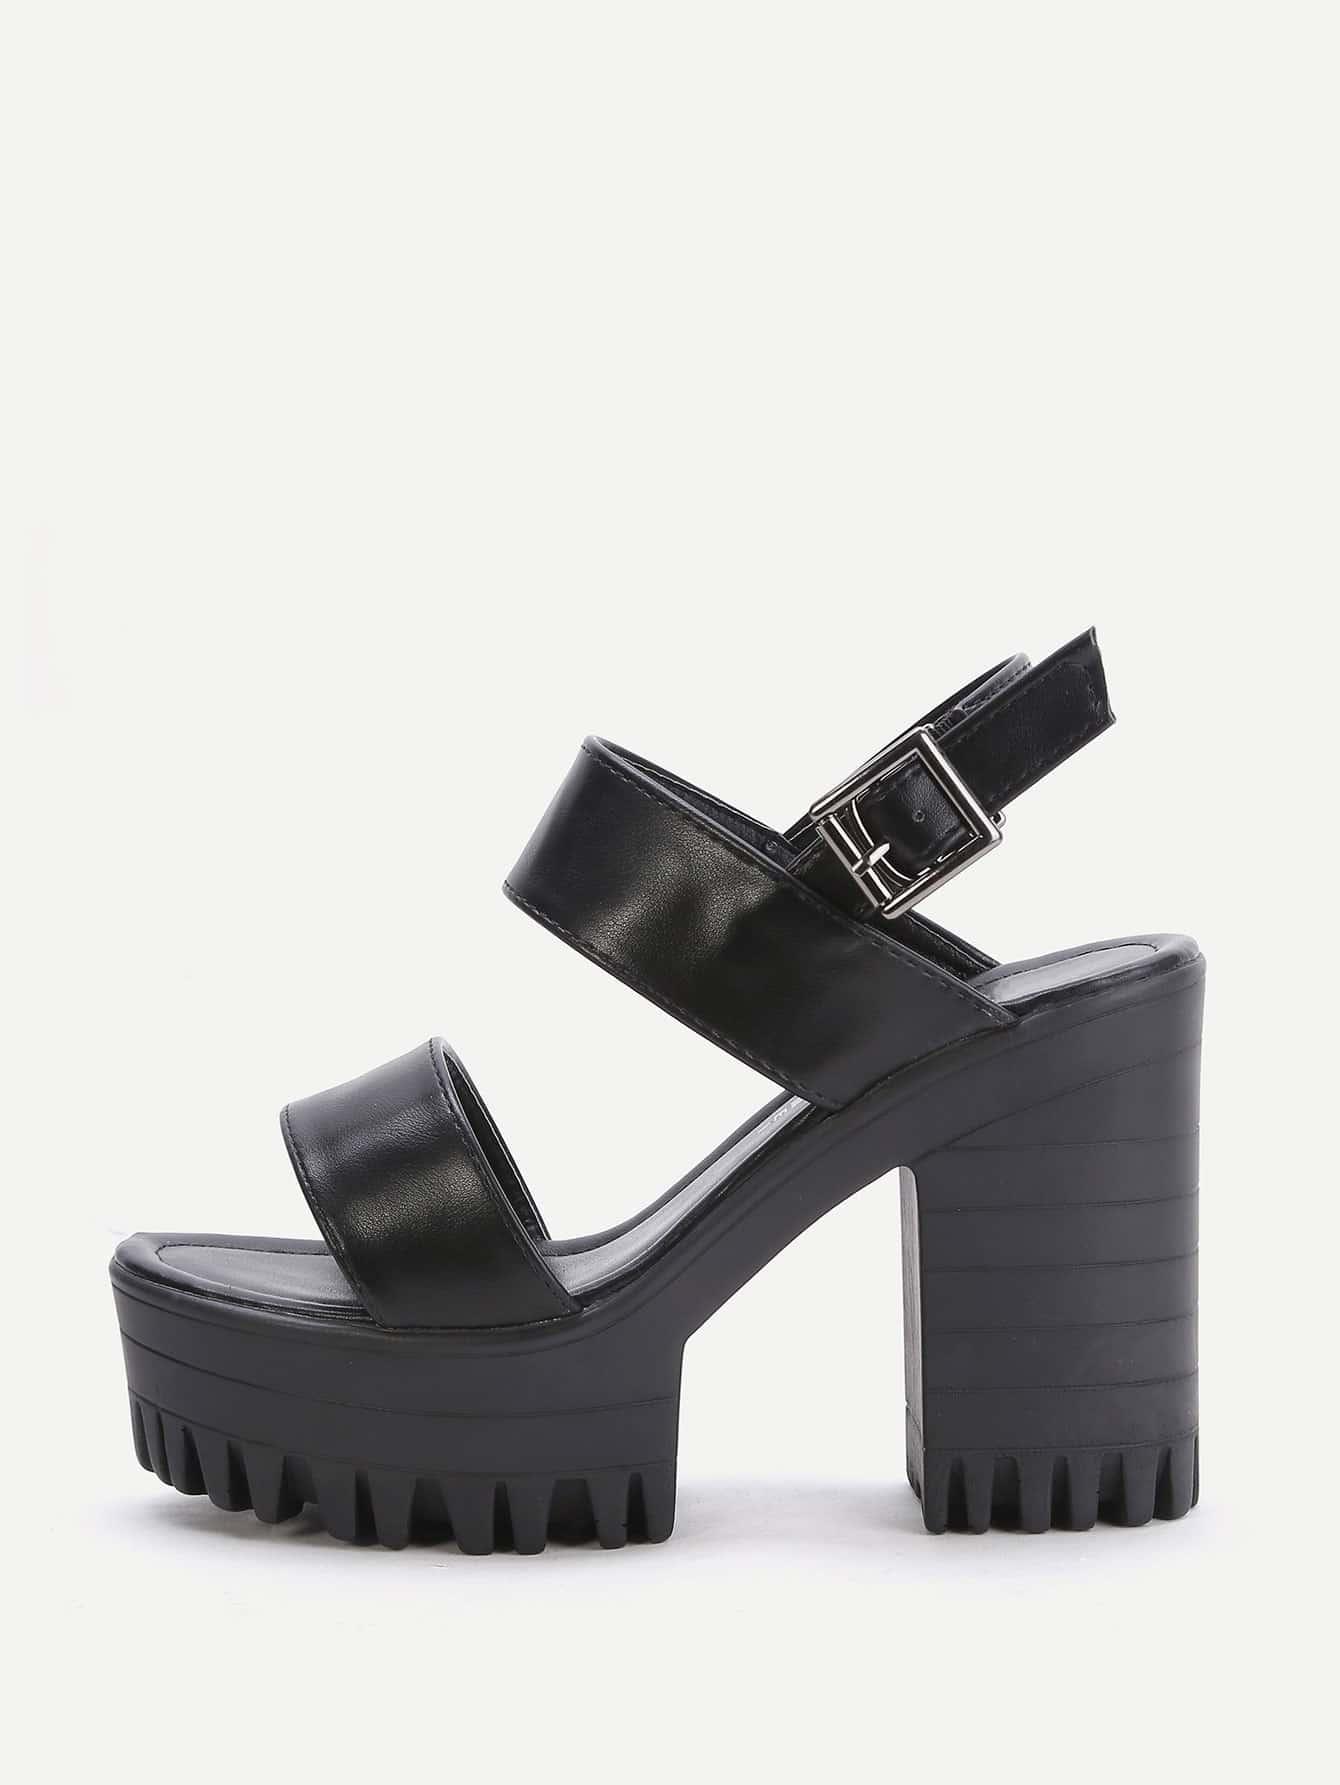 Image of Black Platform Chunky Heeled PU Sandals